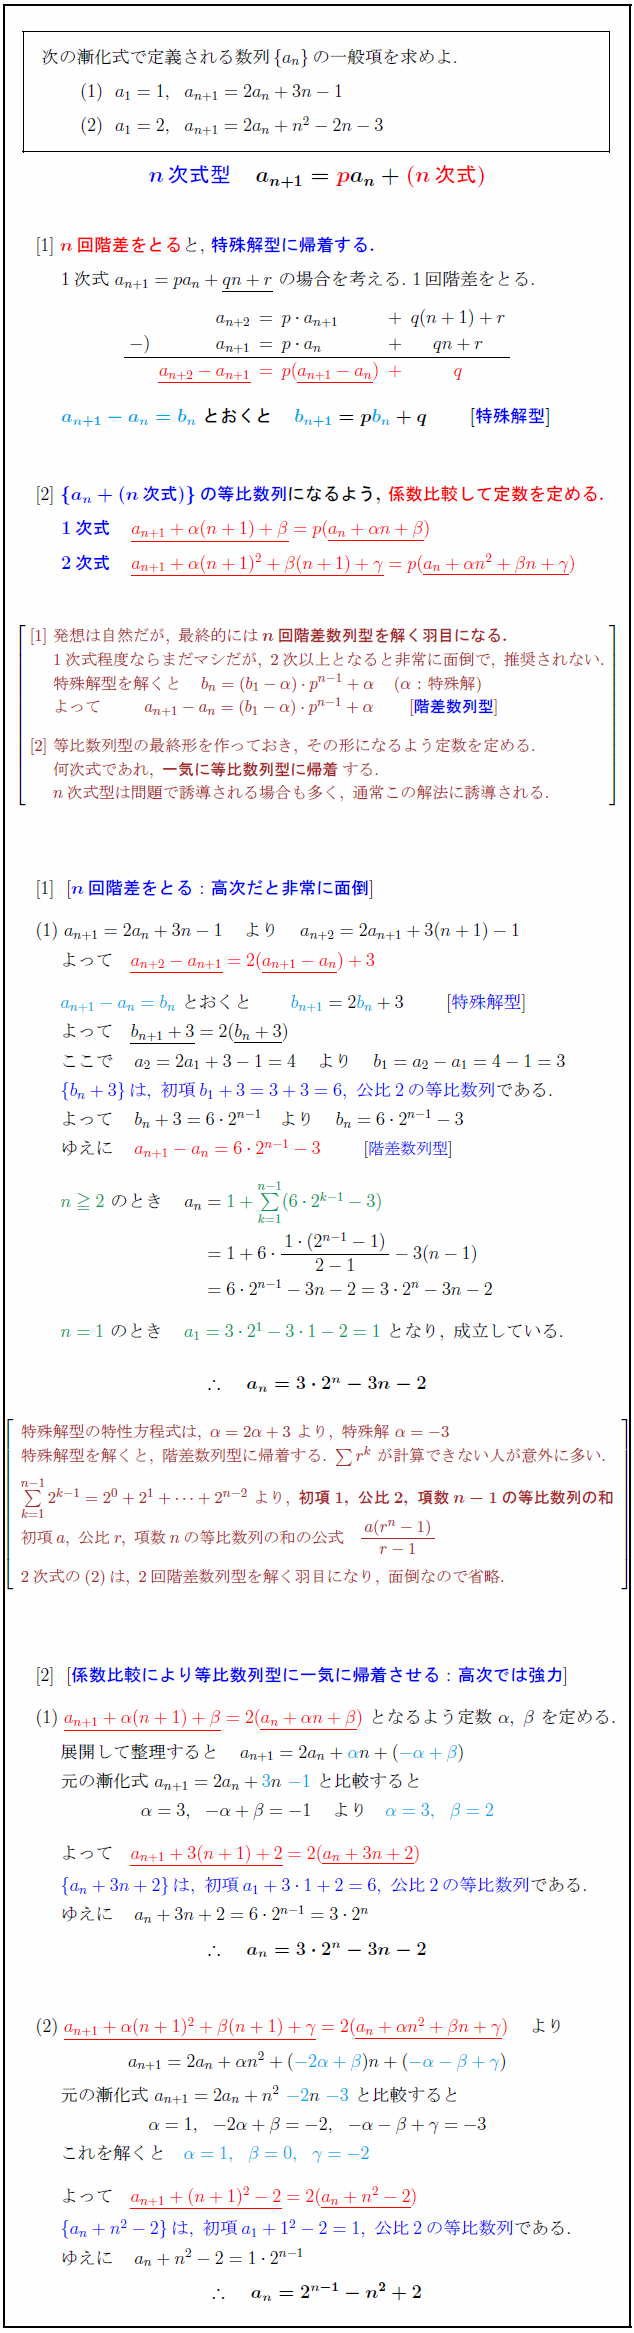 n-degree